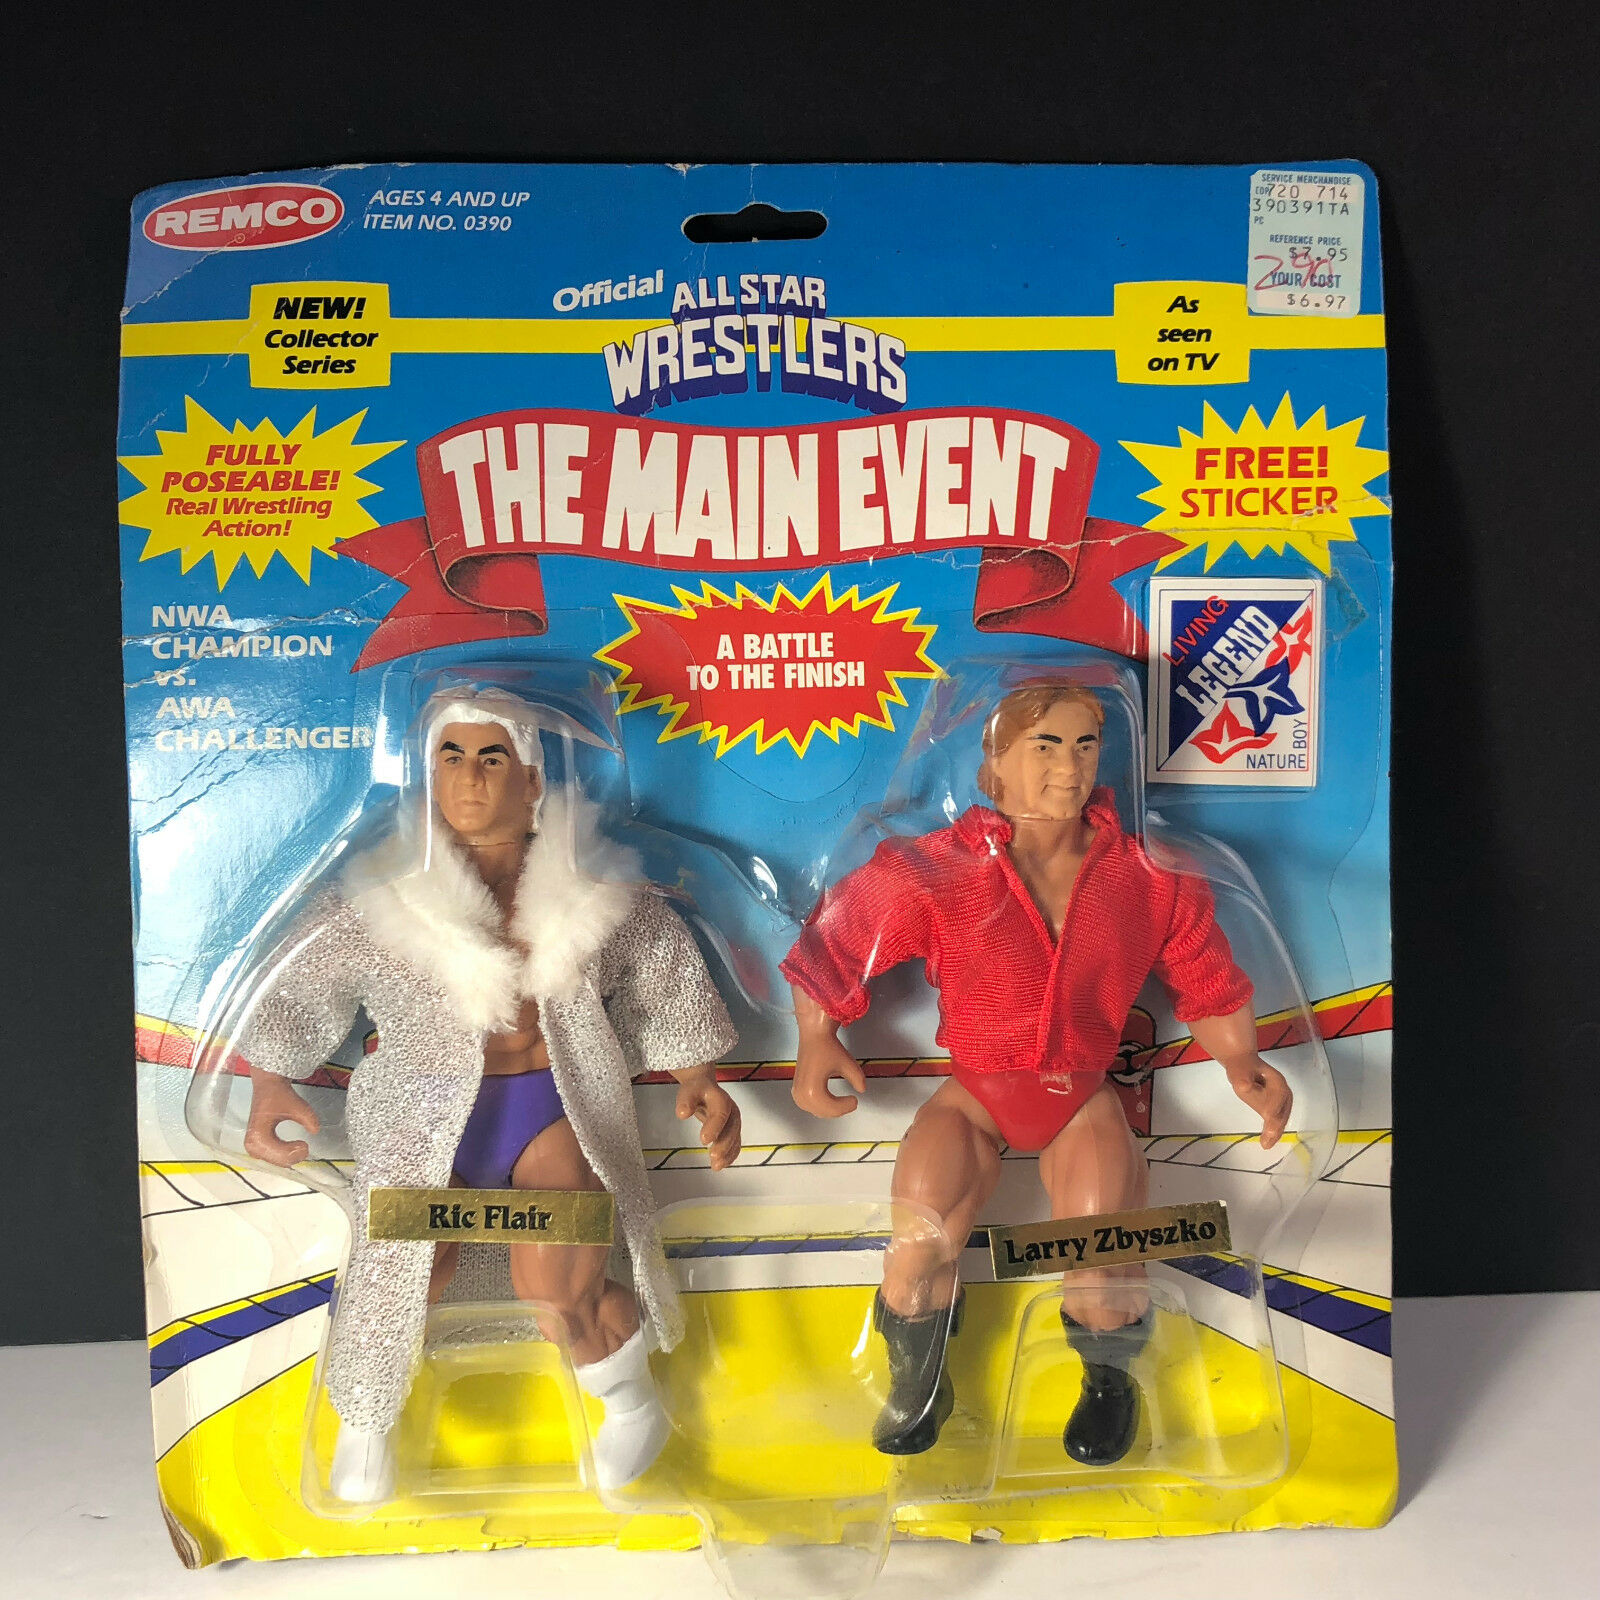 1985 REMCO AWA WRESTLING ACTION FIGURE MOC NATURE BOY RIC FLAIR LARRY ZBYSKO WWE